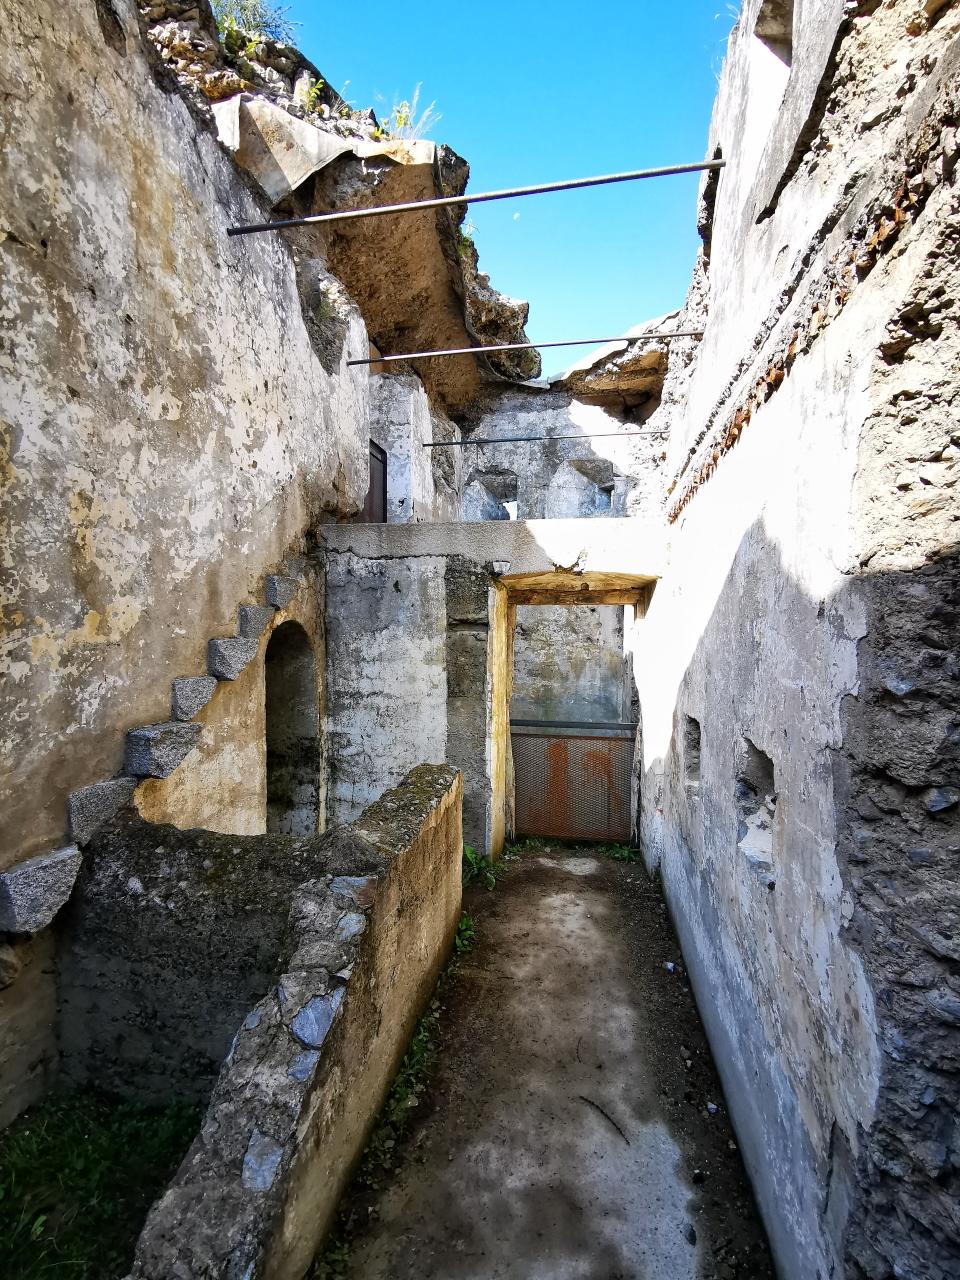 Blick in die verfallenen Festung